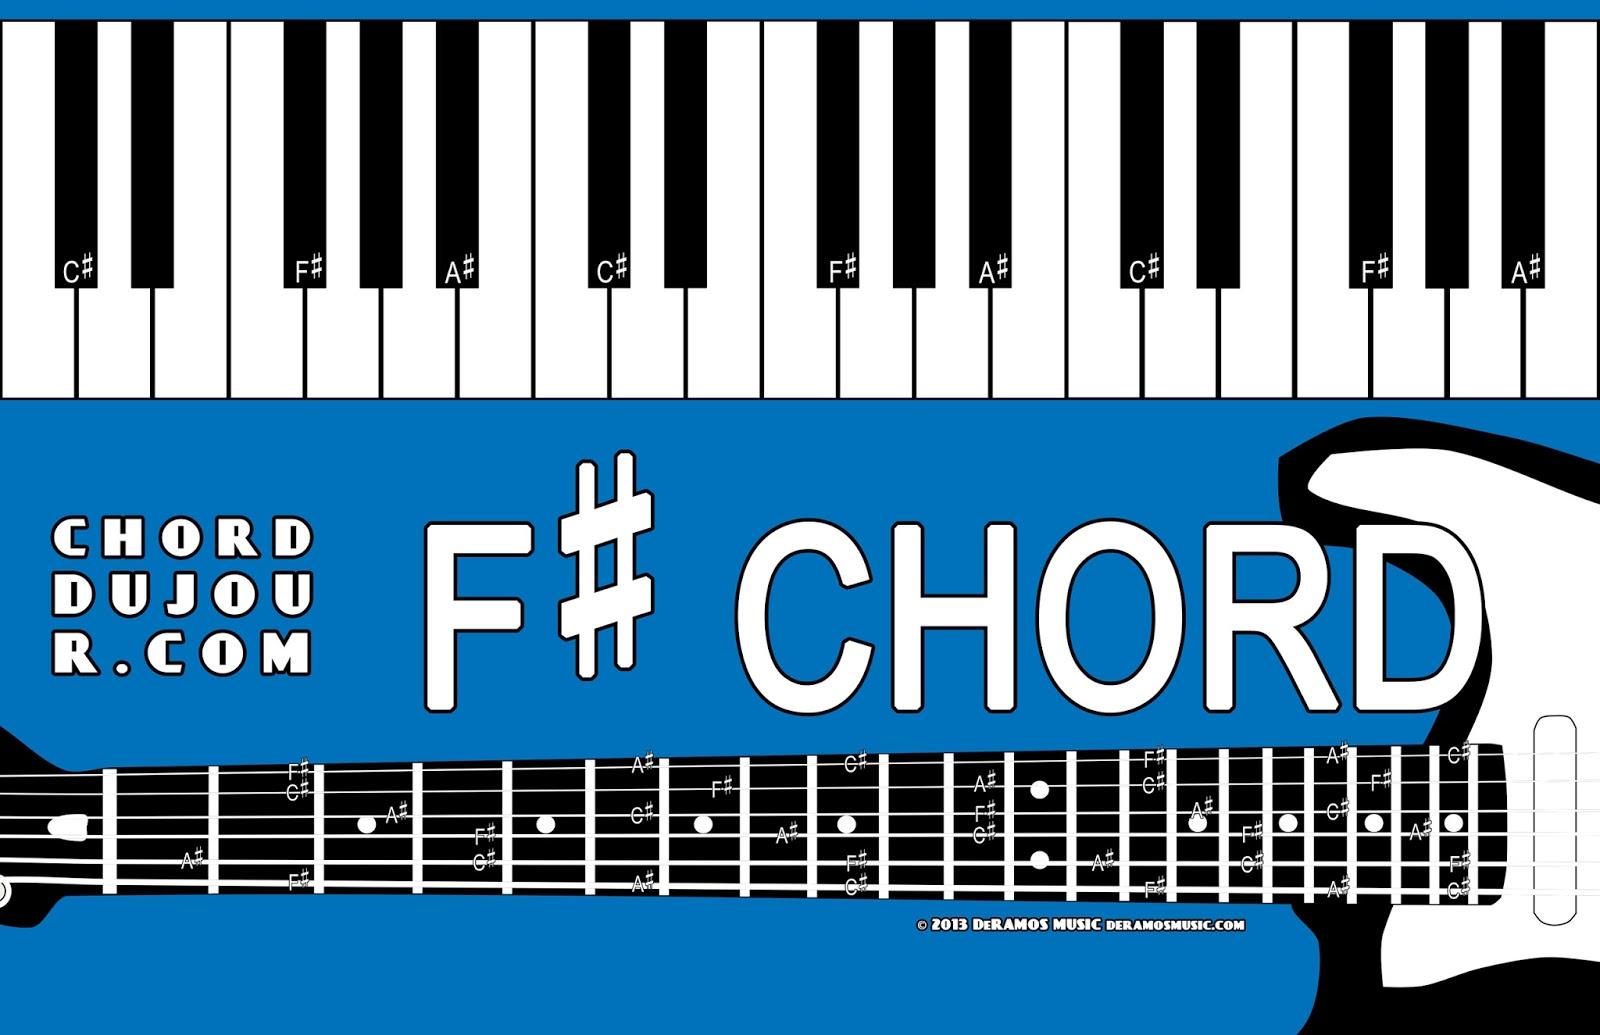 F# Piano Chord Chord Du Jour Dictionary F Chord